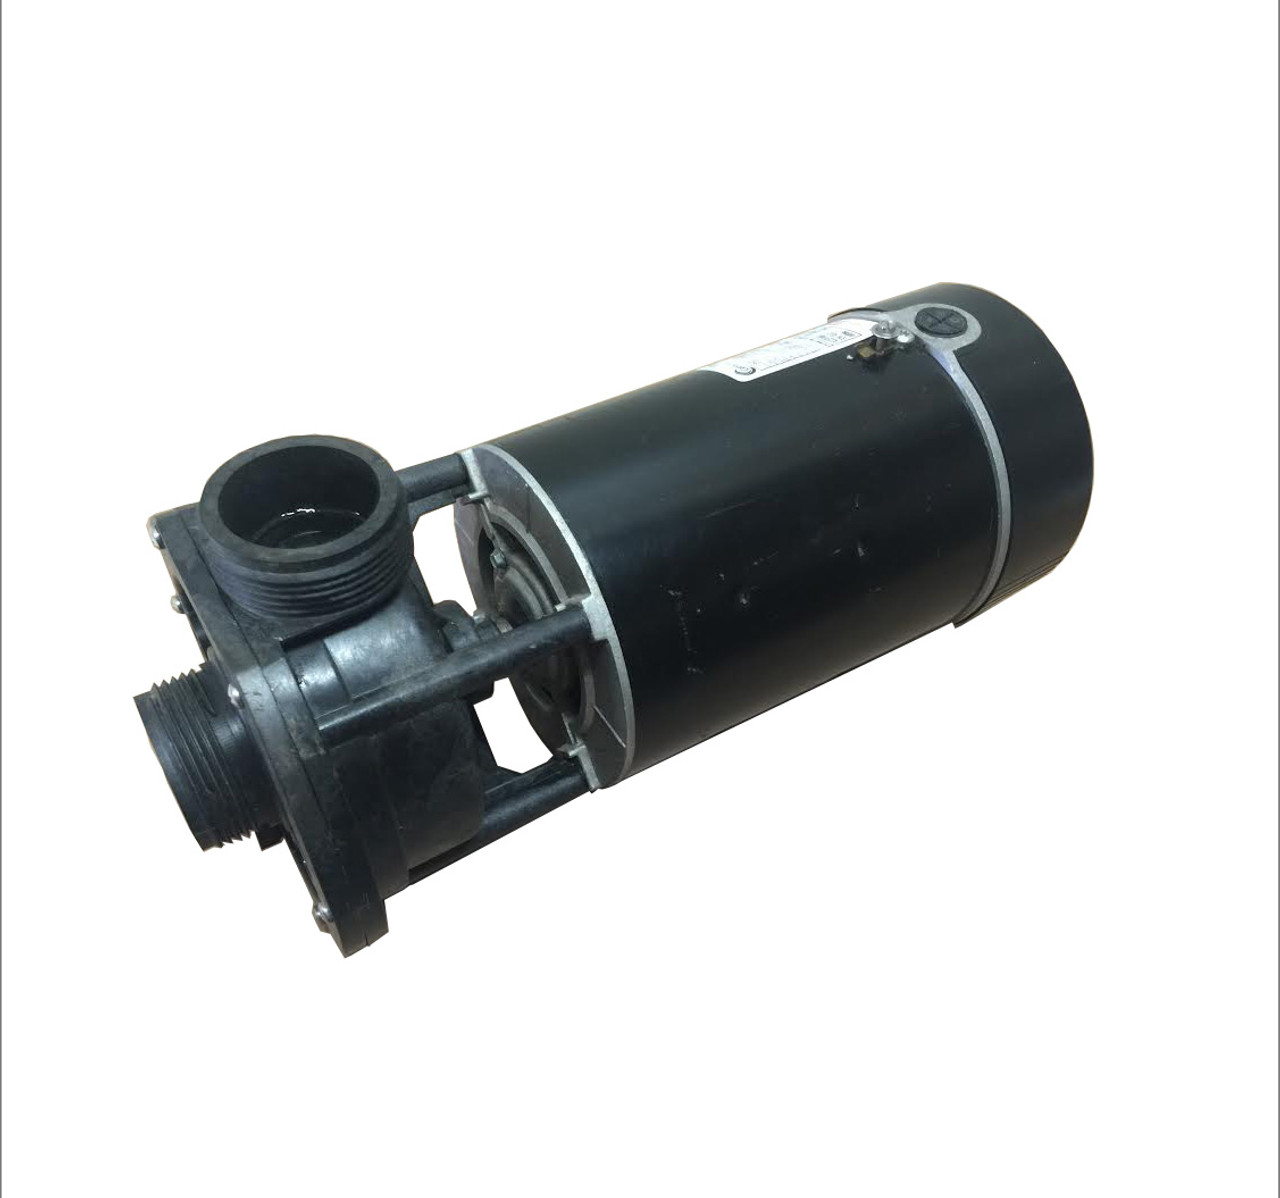 Replacement for Softub Hot Tub Pump 115 Volt 03510138-2 - Spa Parts ...